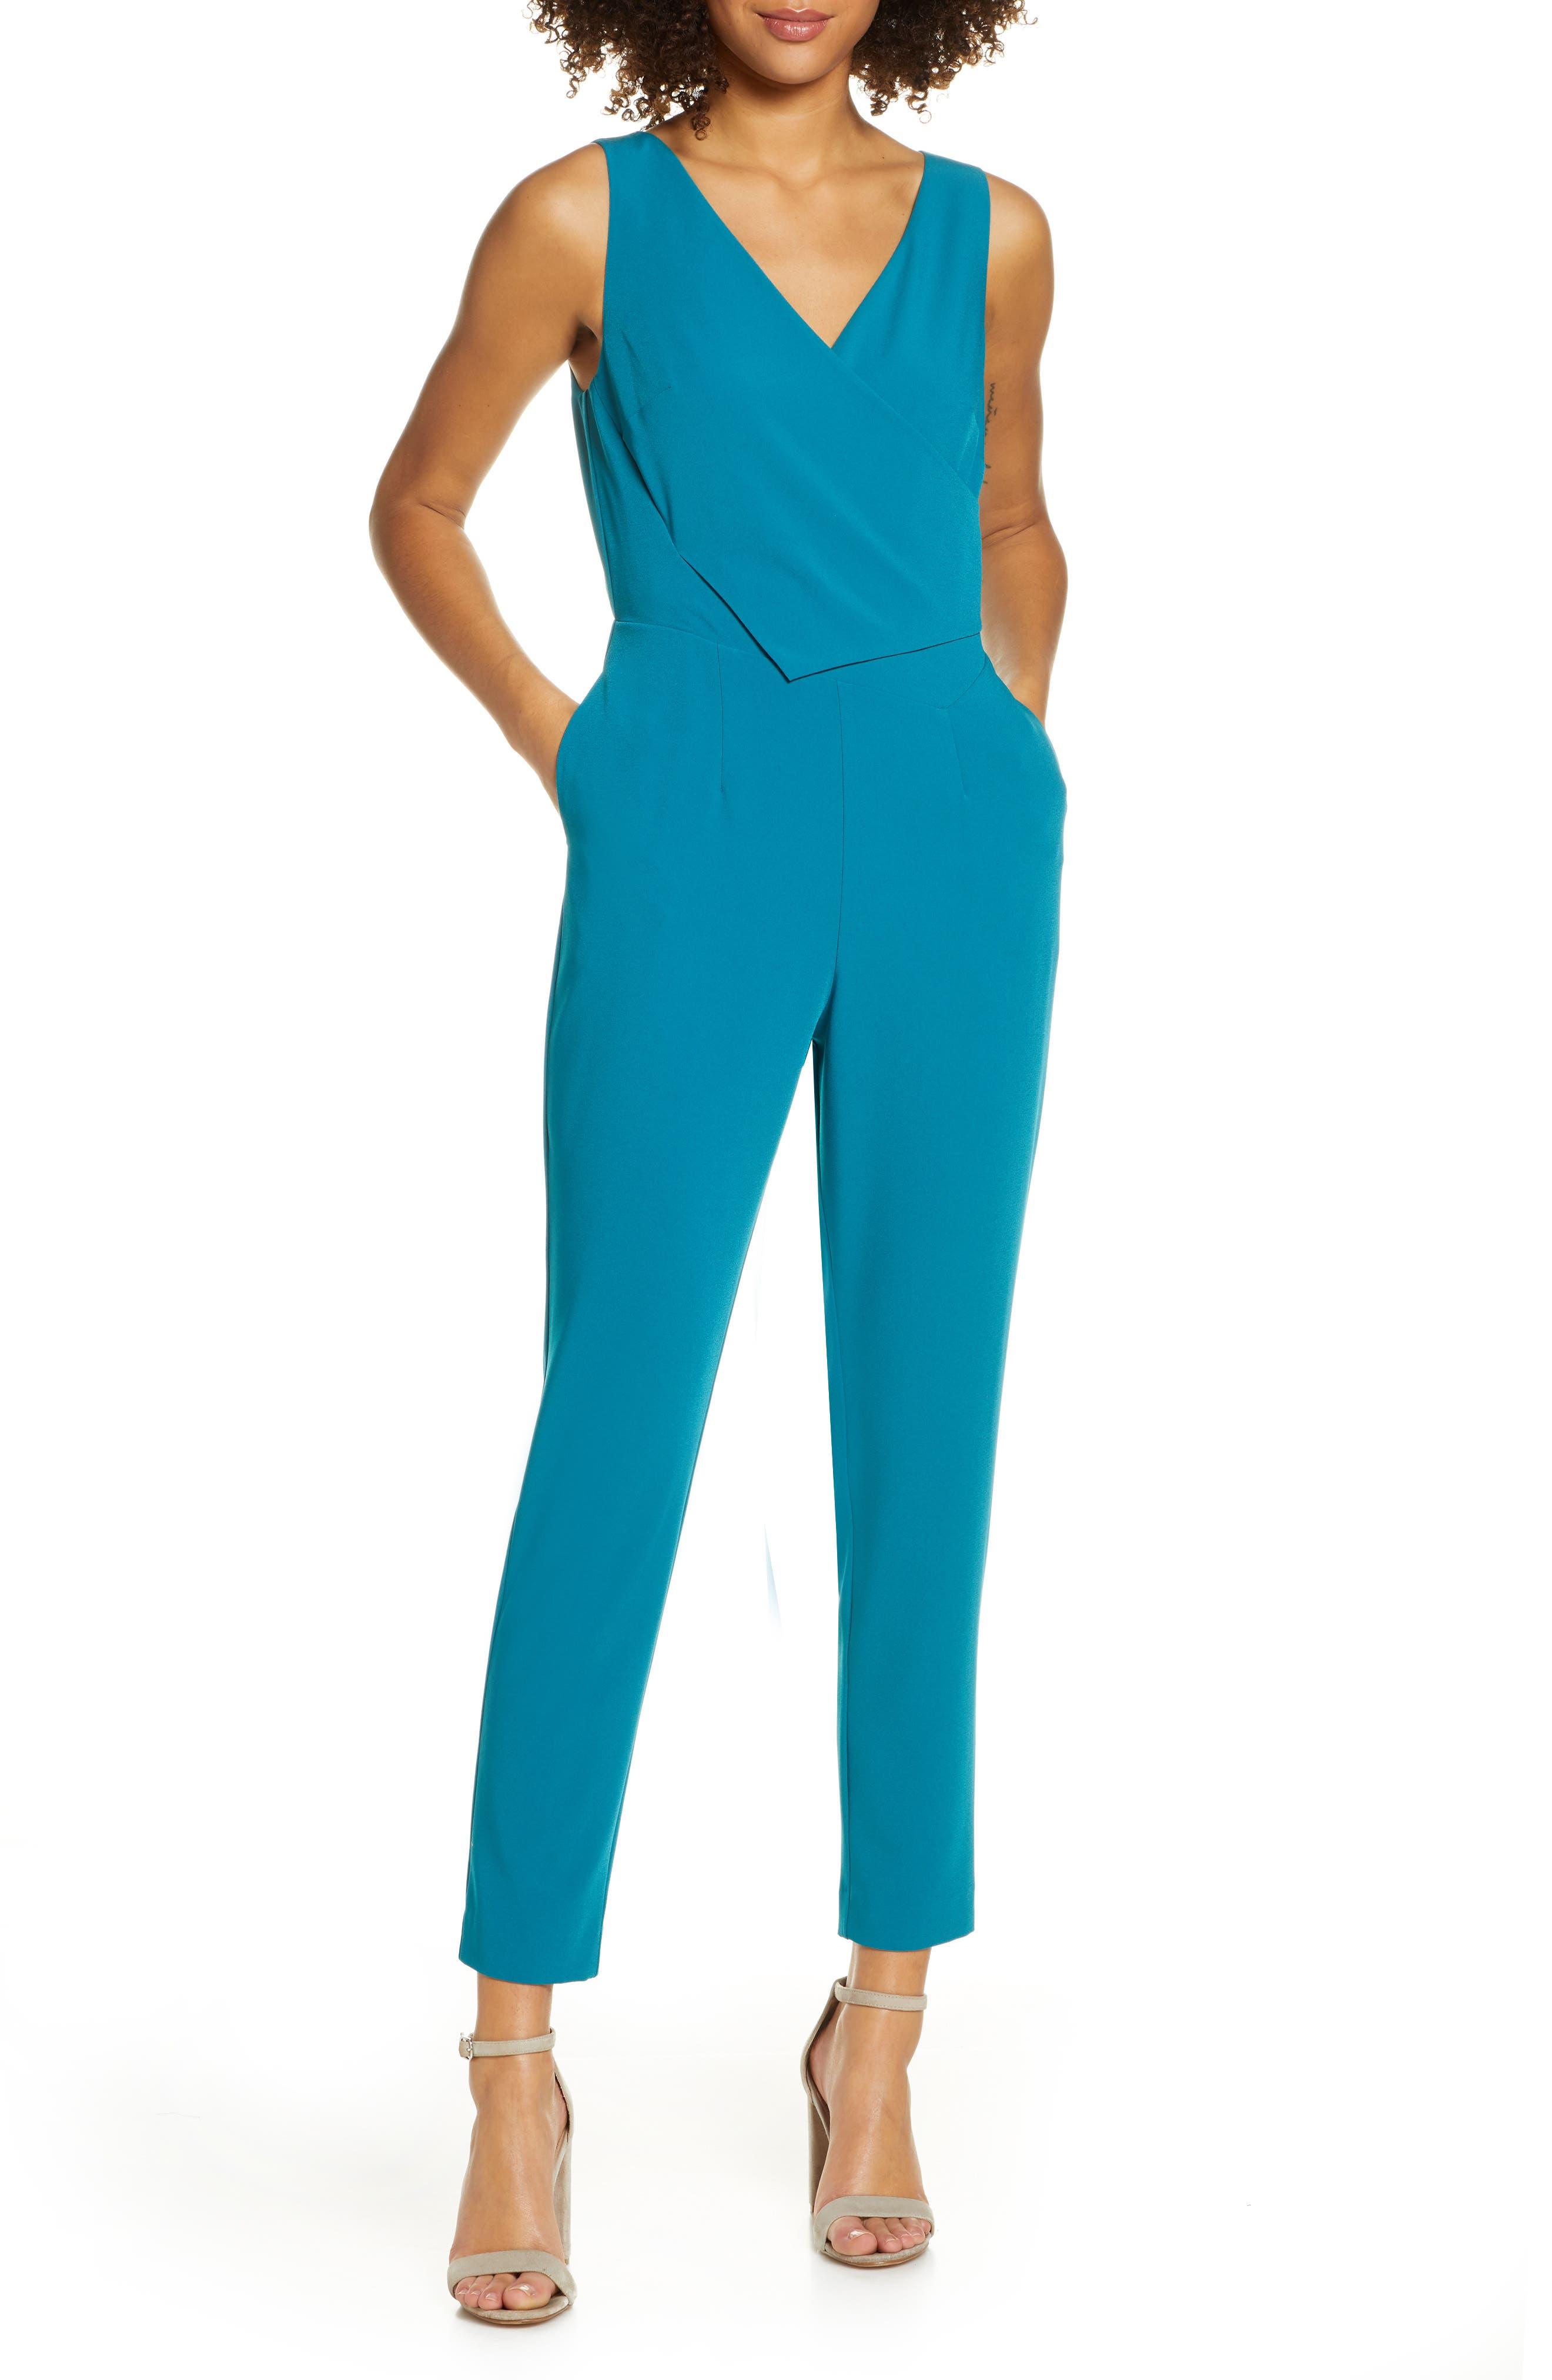 Image of Ali & Jay Sleeveless Slim Leg Asymmetrical Jumpsuit